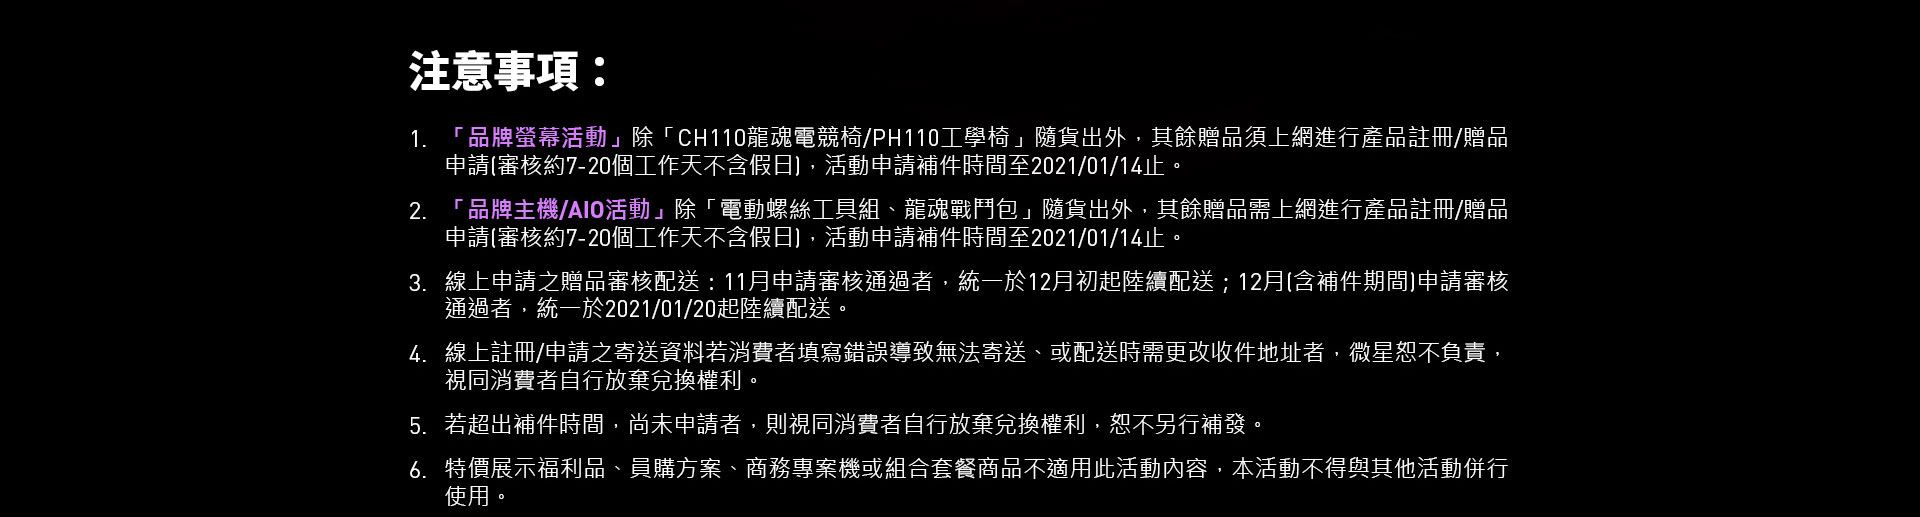 notice01